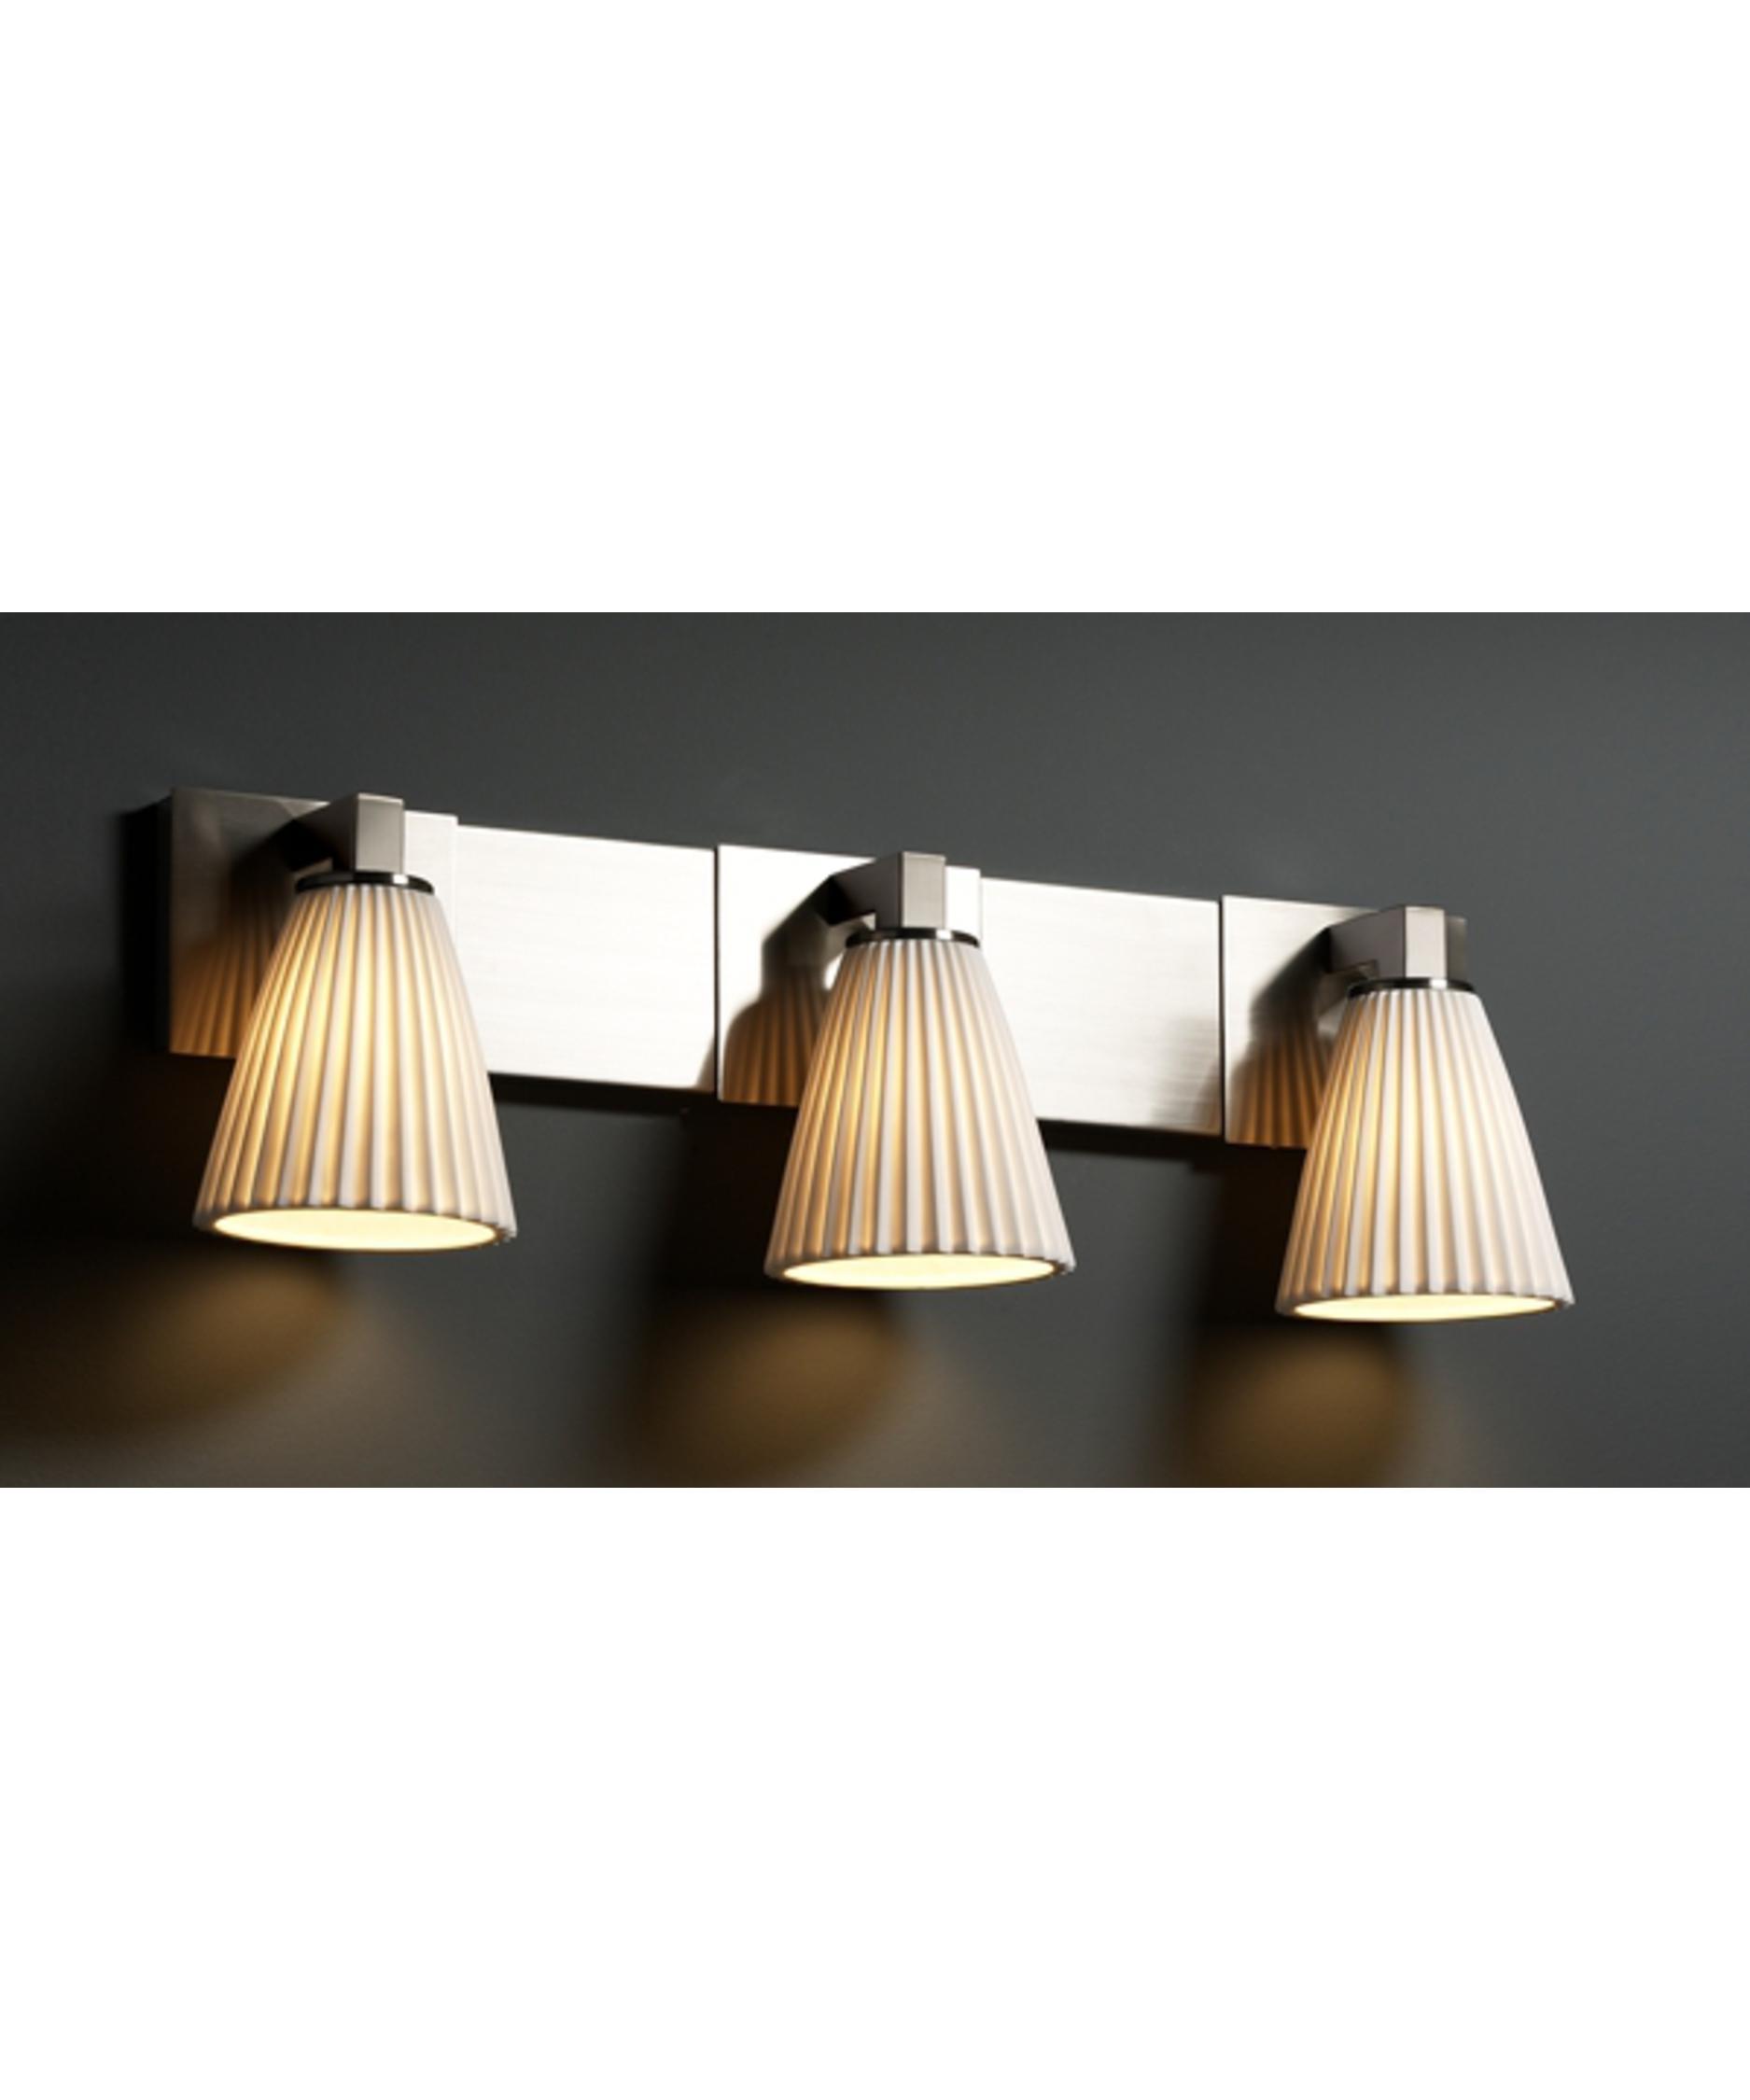 Justice design group limoges modular 27 inch bath vanity light capitol lighting 1 - Justice design group bathroom lighting ...